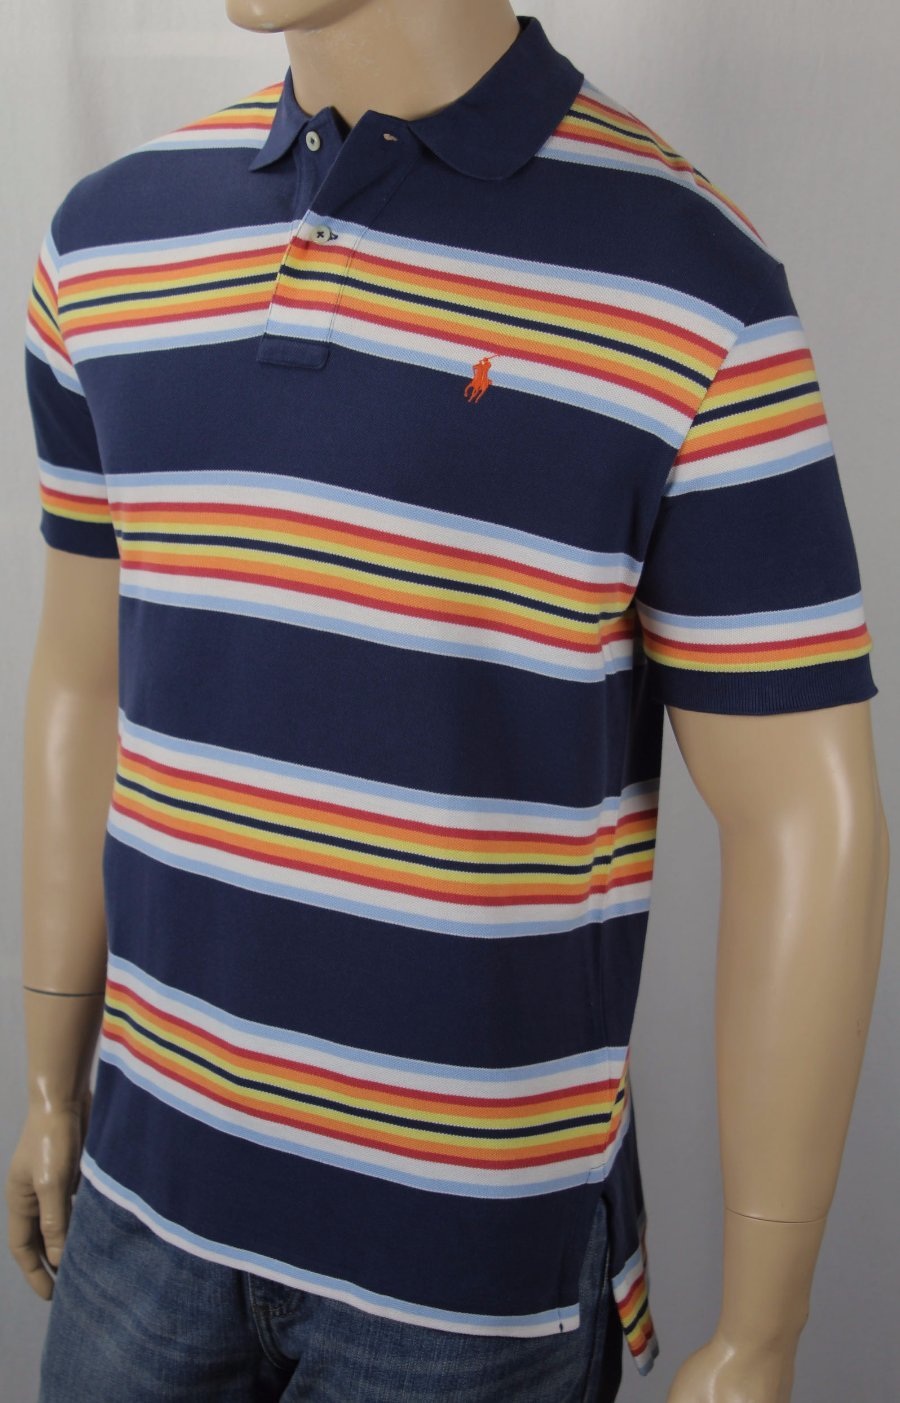 118c8bbbc Details about Polo Ralph Lauren Navy Blue White Striped Classic Fit Mesh  Shirt Orange Pony NWT